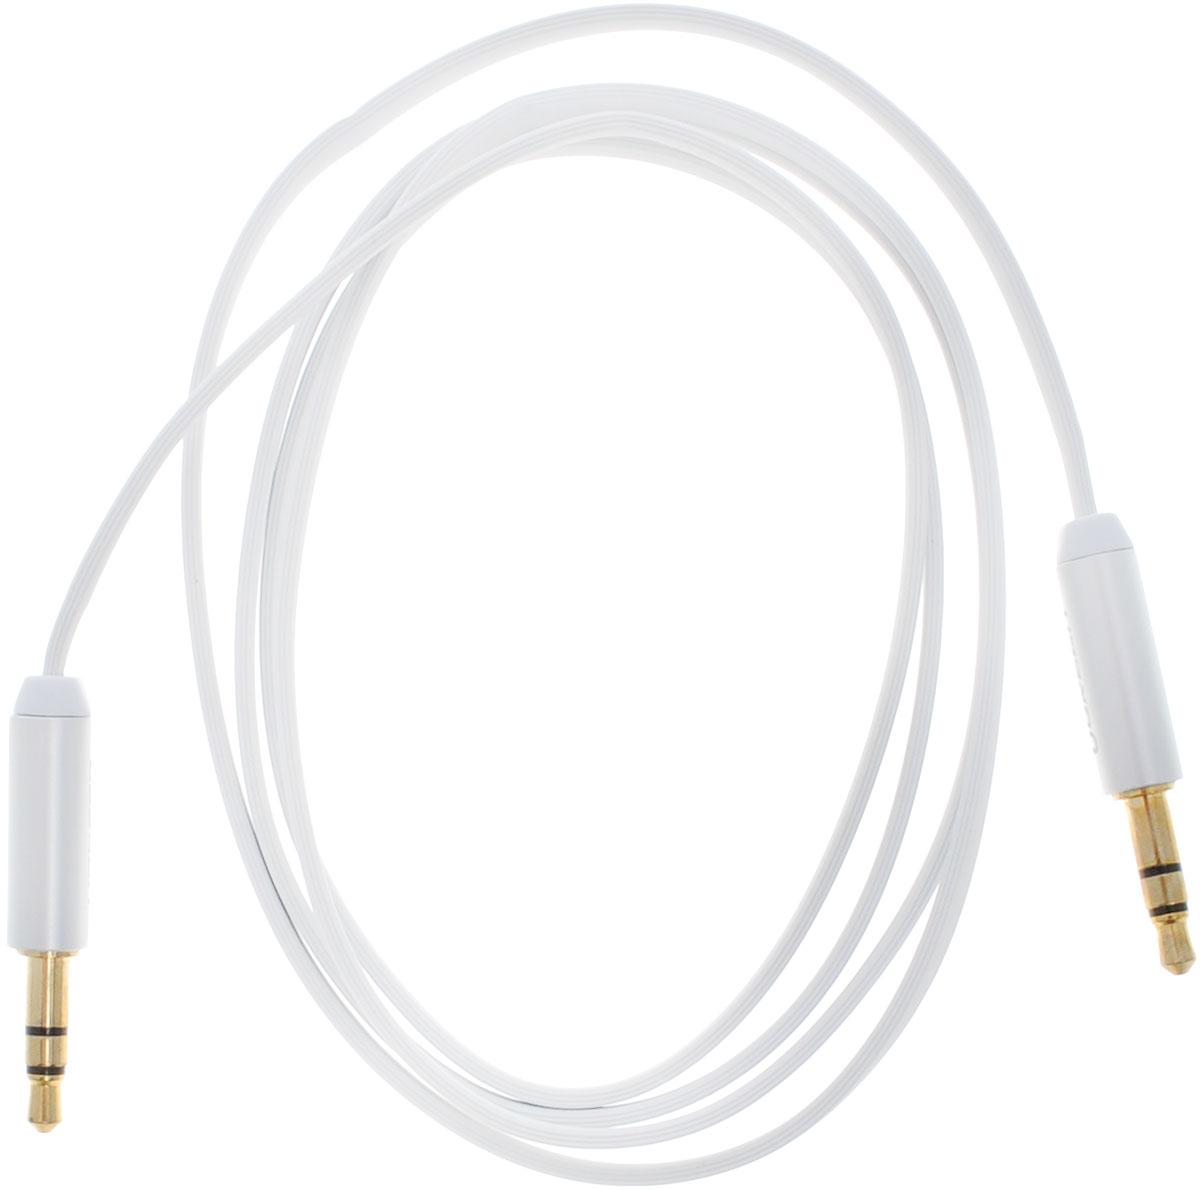 Ugreen UG-10763, White Silver кабель AUX 1 м